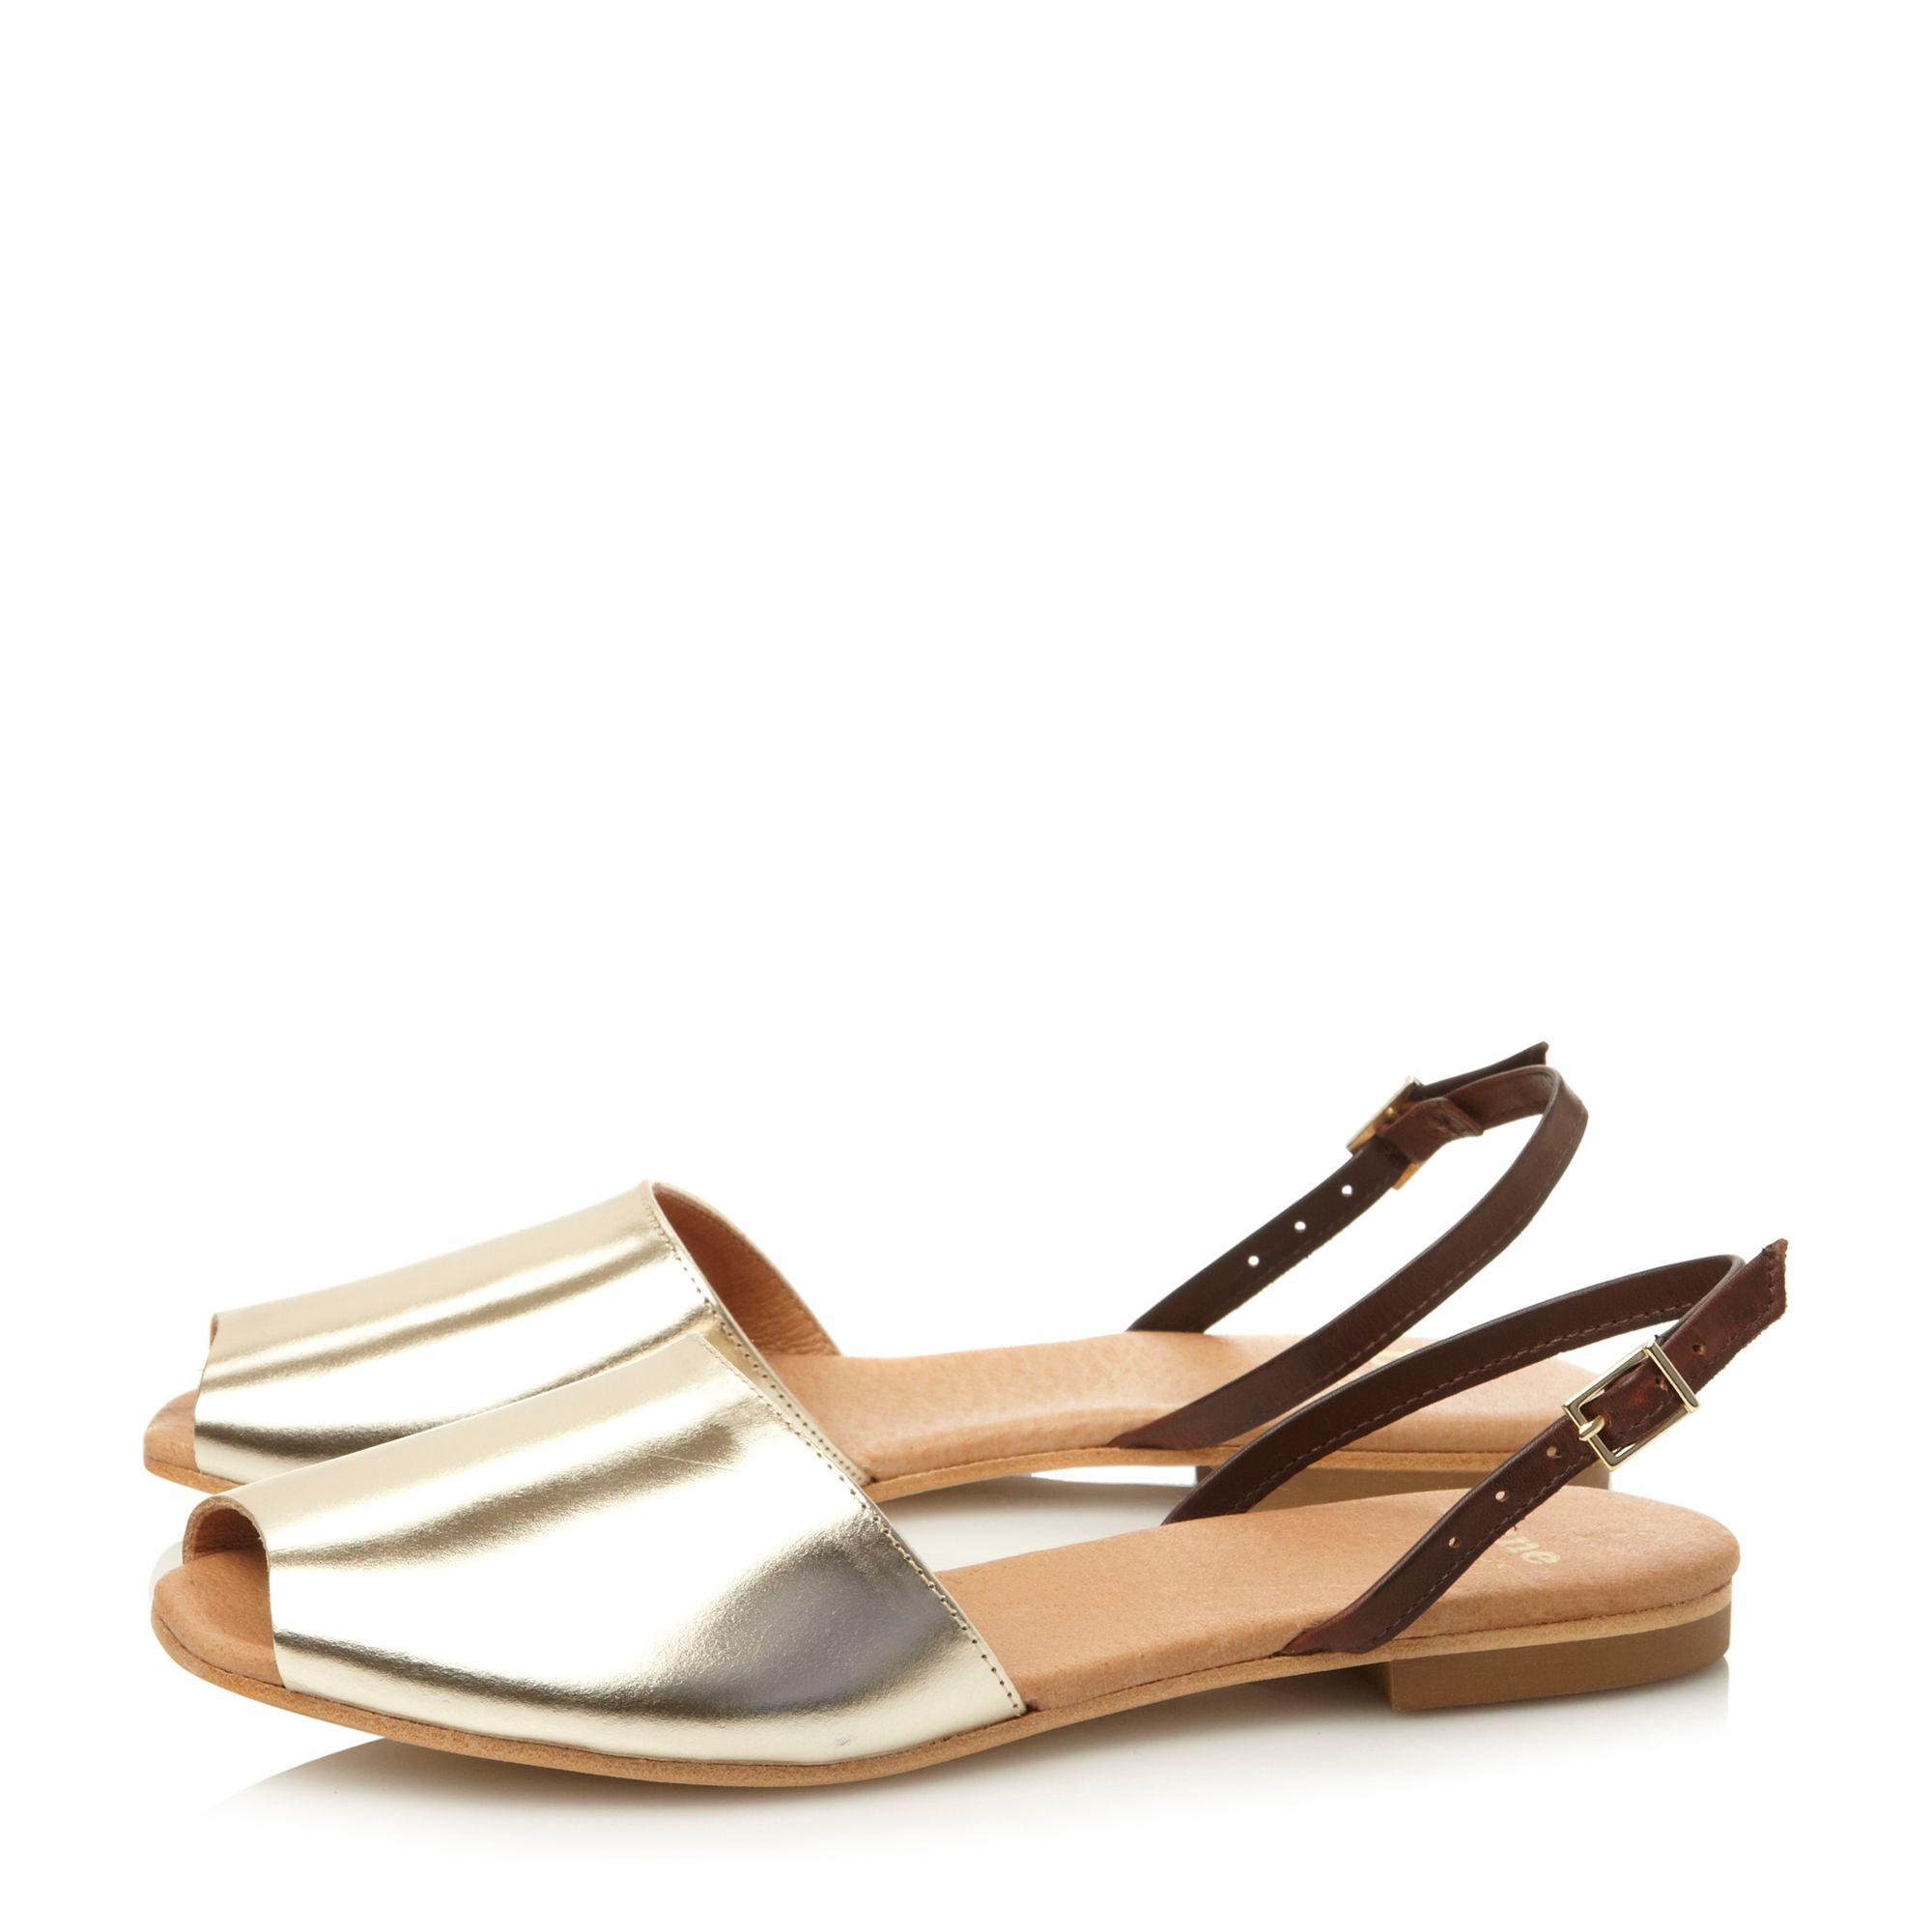 Dune Black Leticia Leather Peeptoe Flat Shoes In Metallic   Lyst